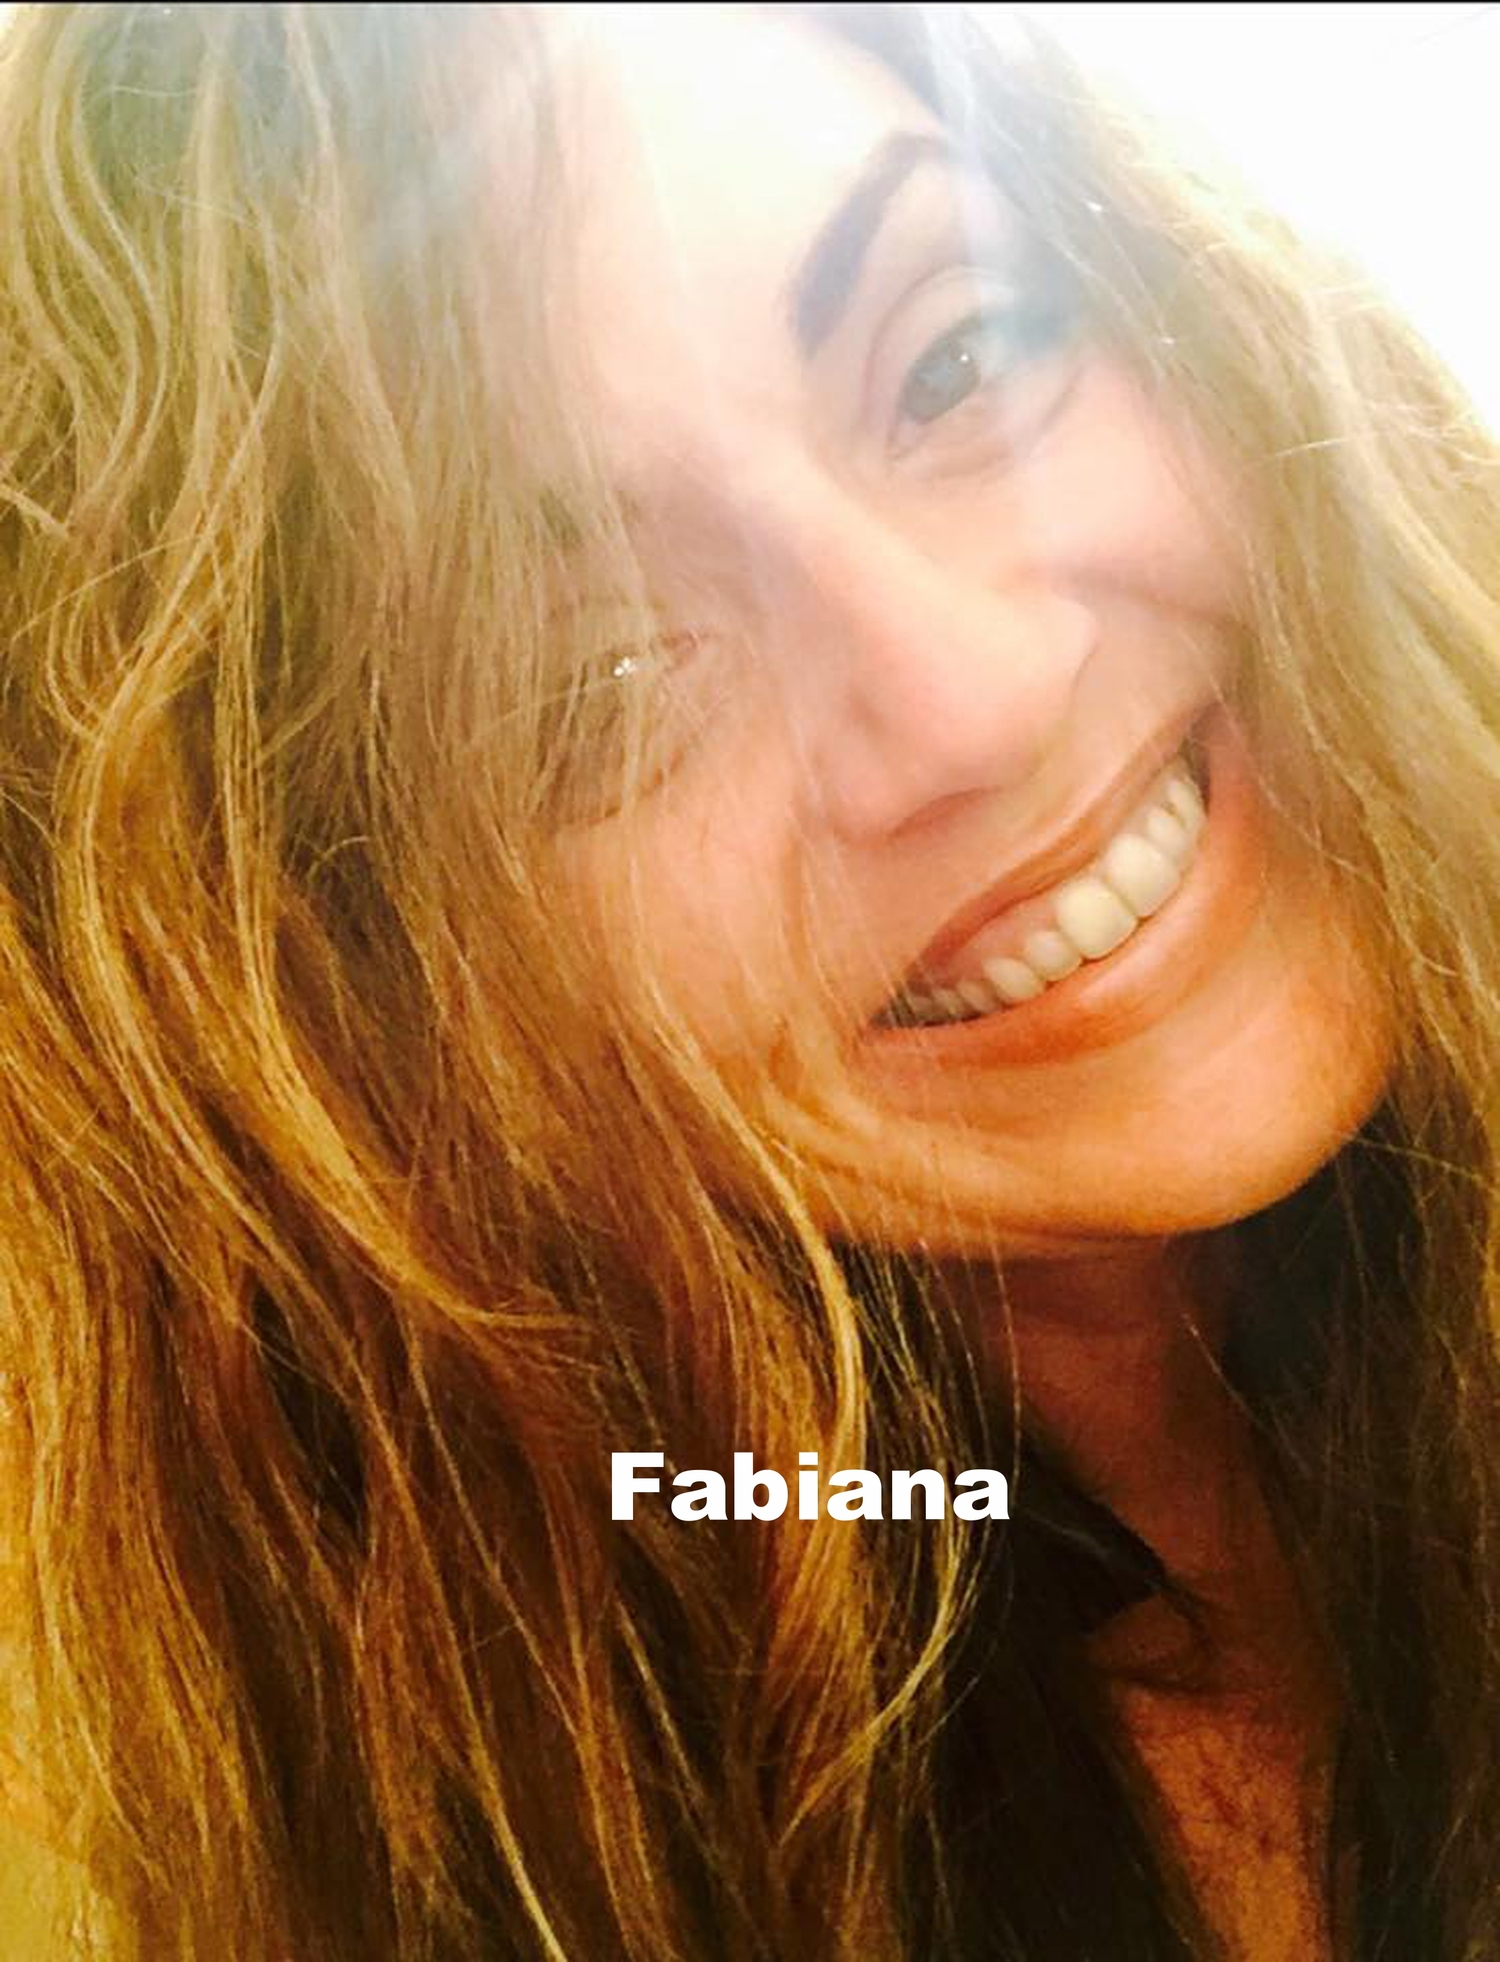 Fabianaedit.jpg